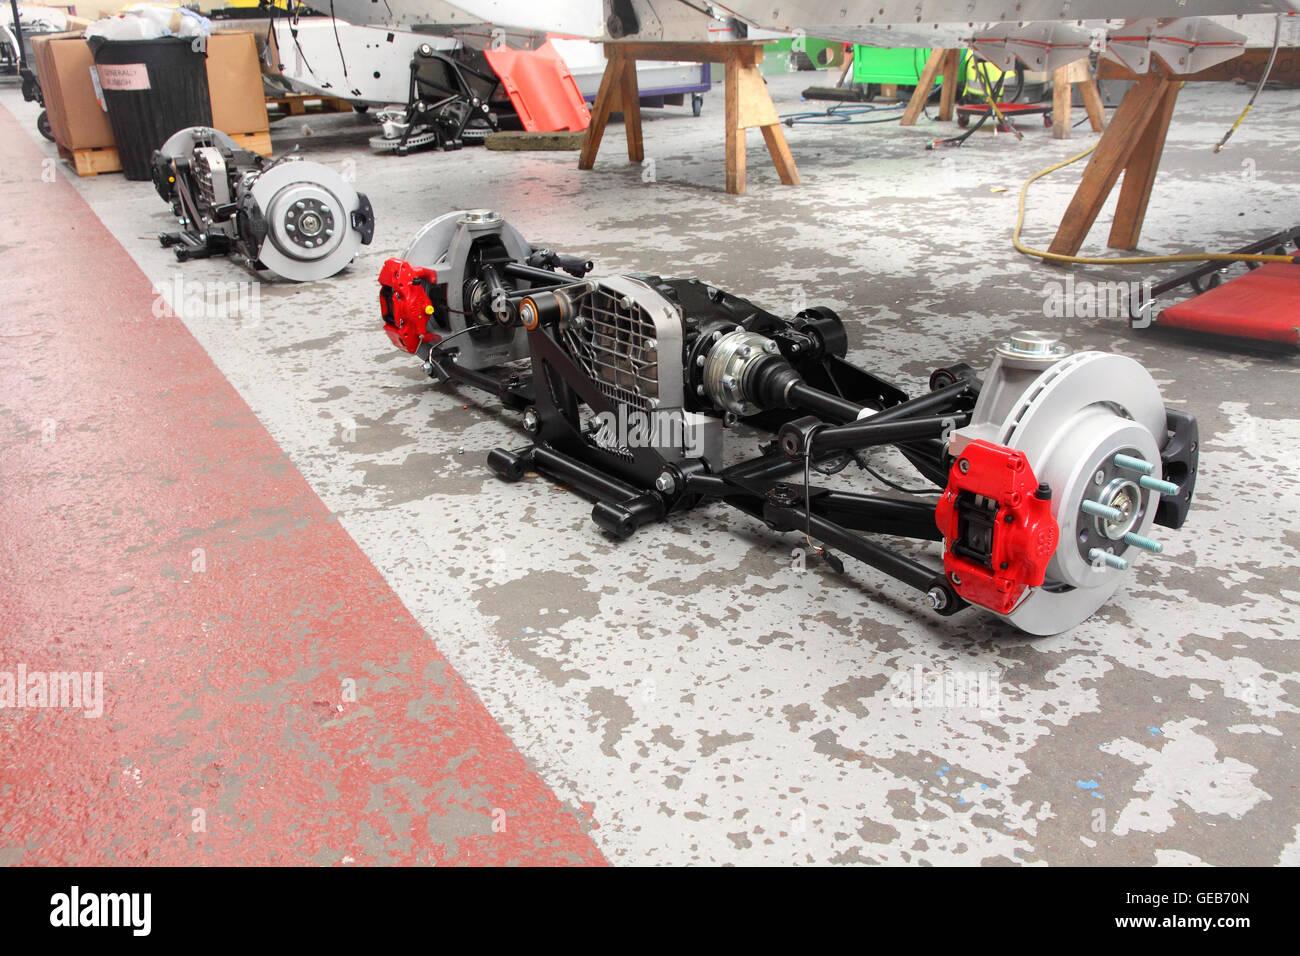 Axle Rear Stockfotos & Axle Rear Bilder - Alamy